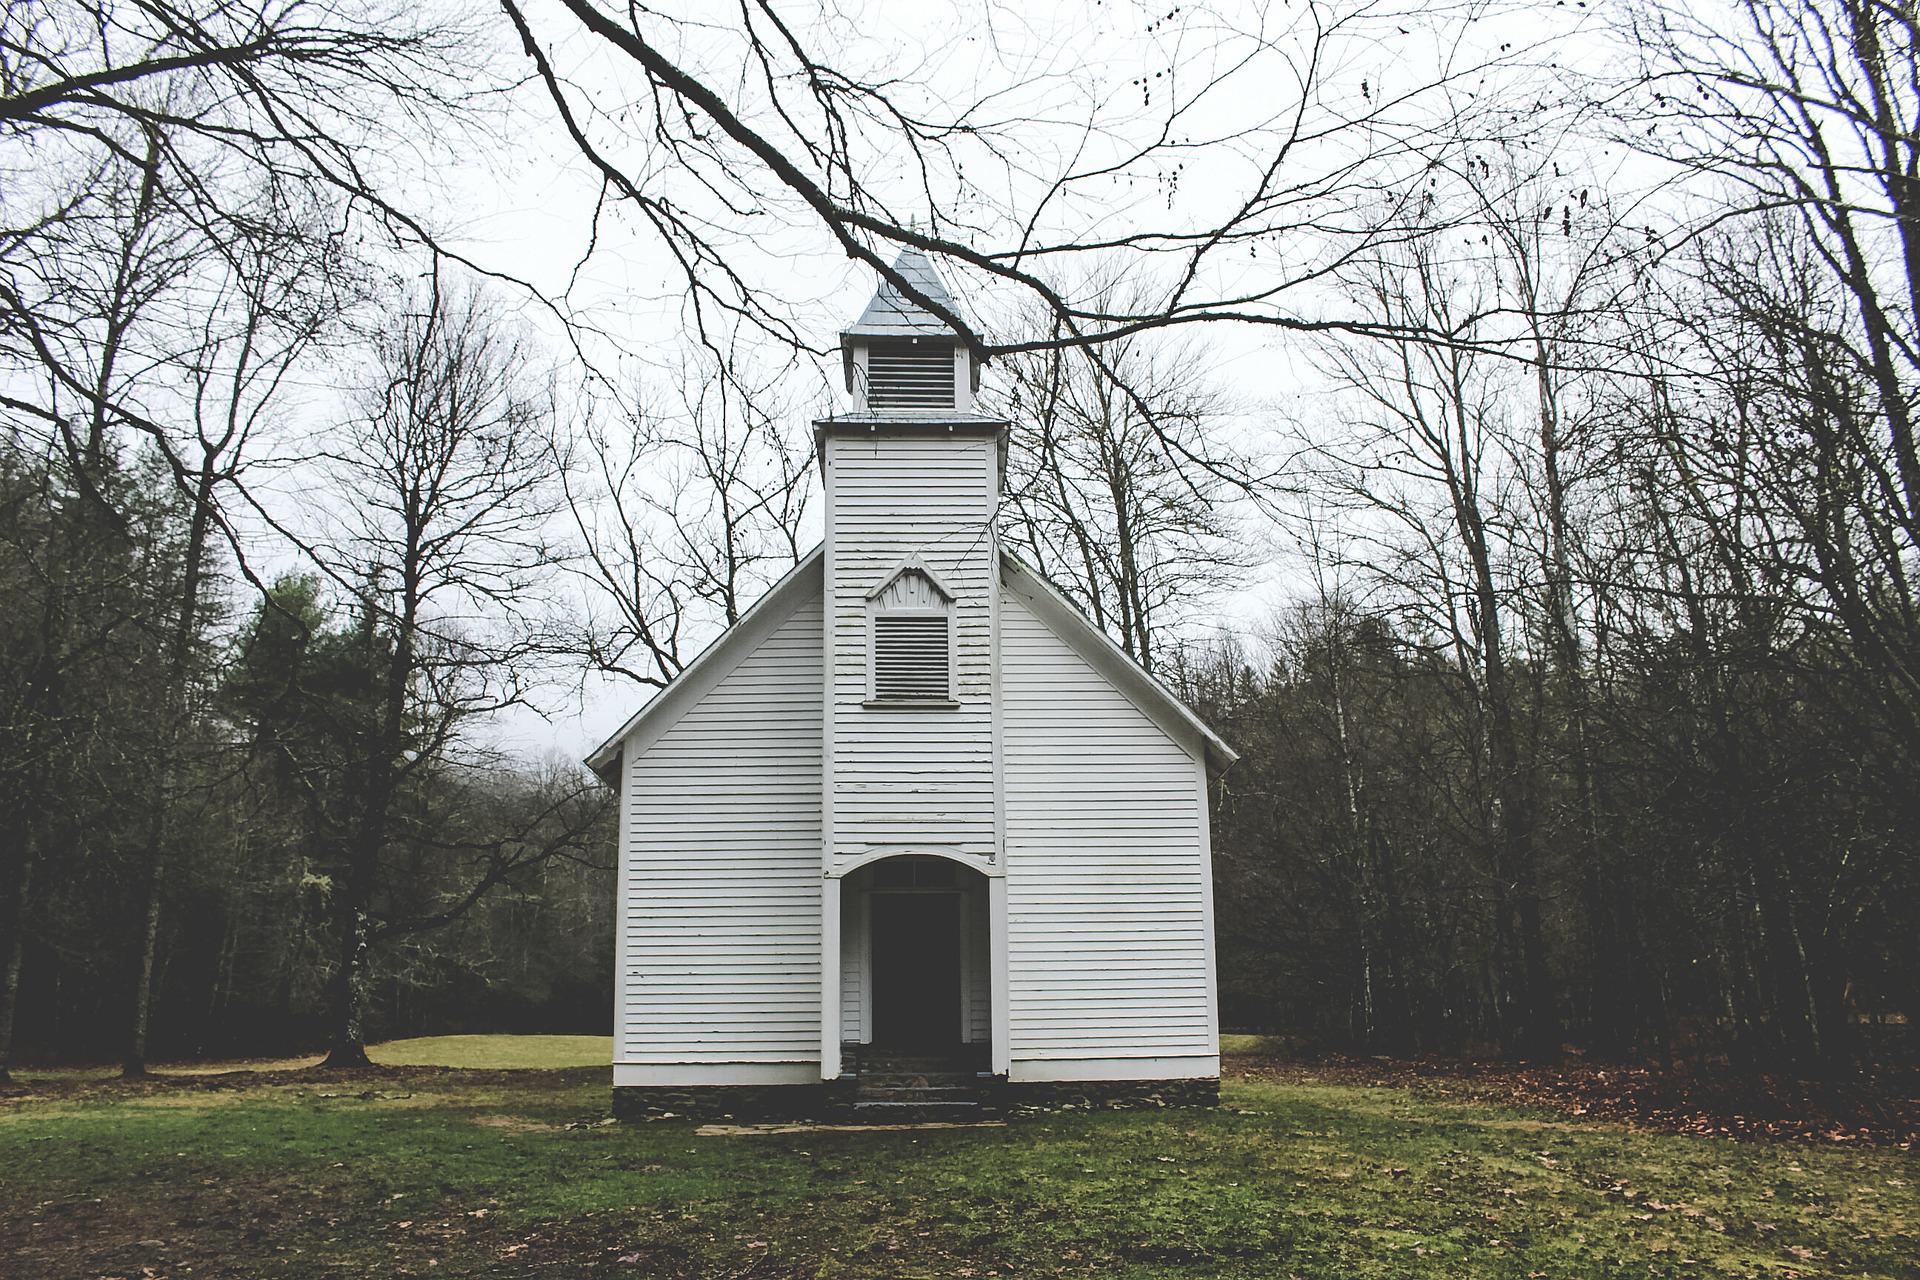 church-581069_1920.jpg